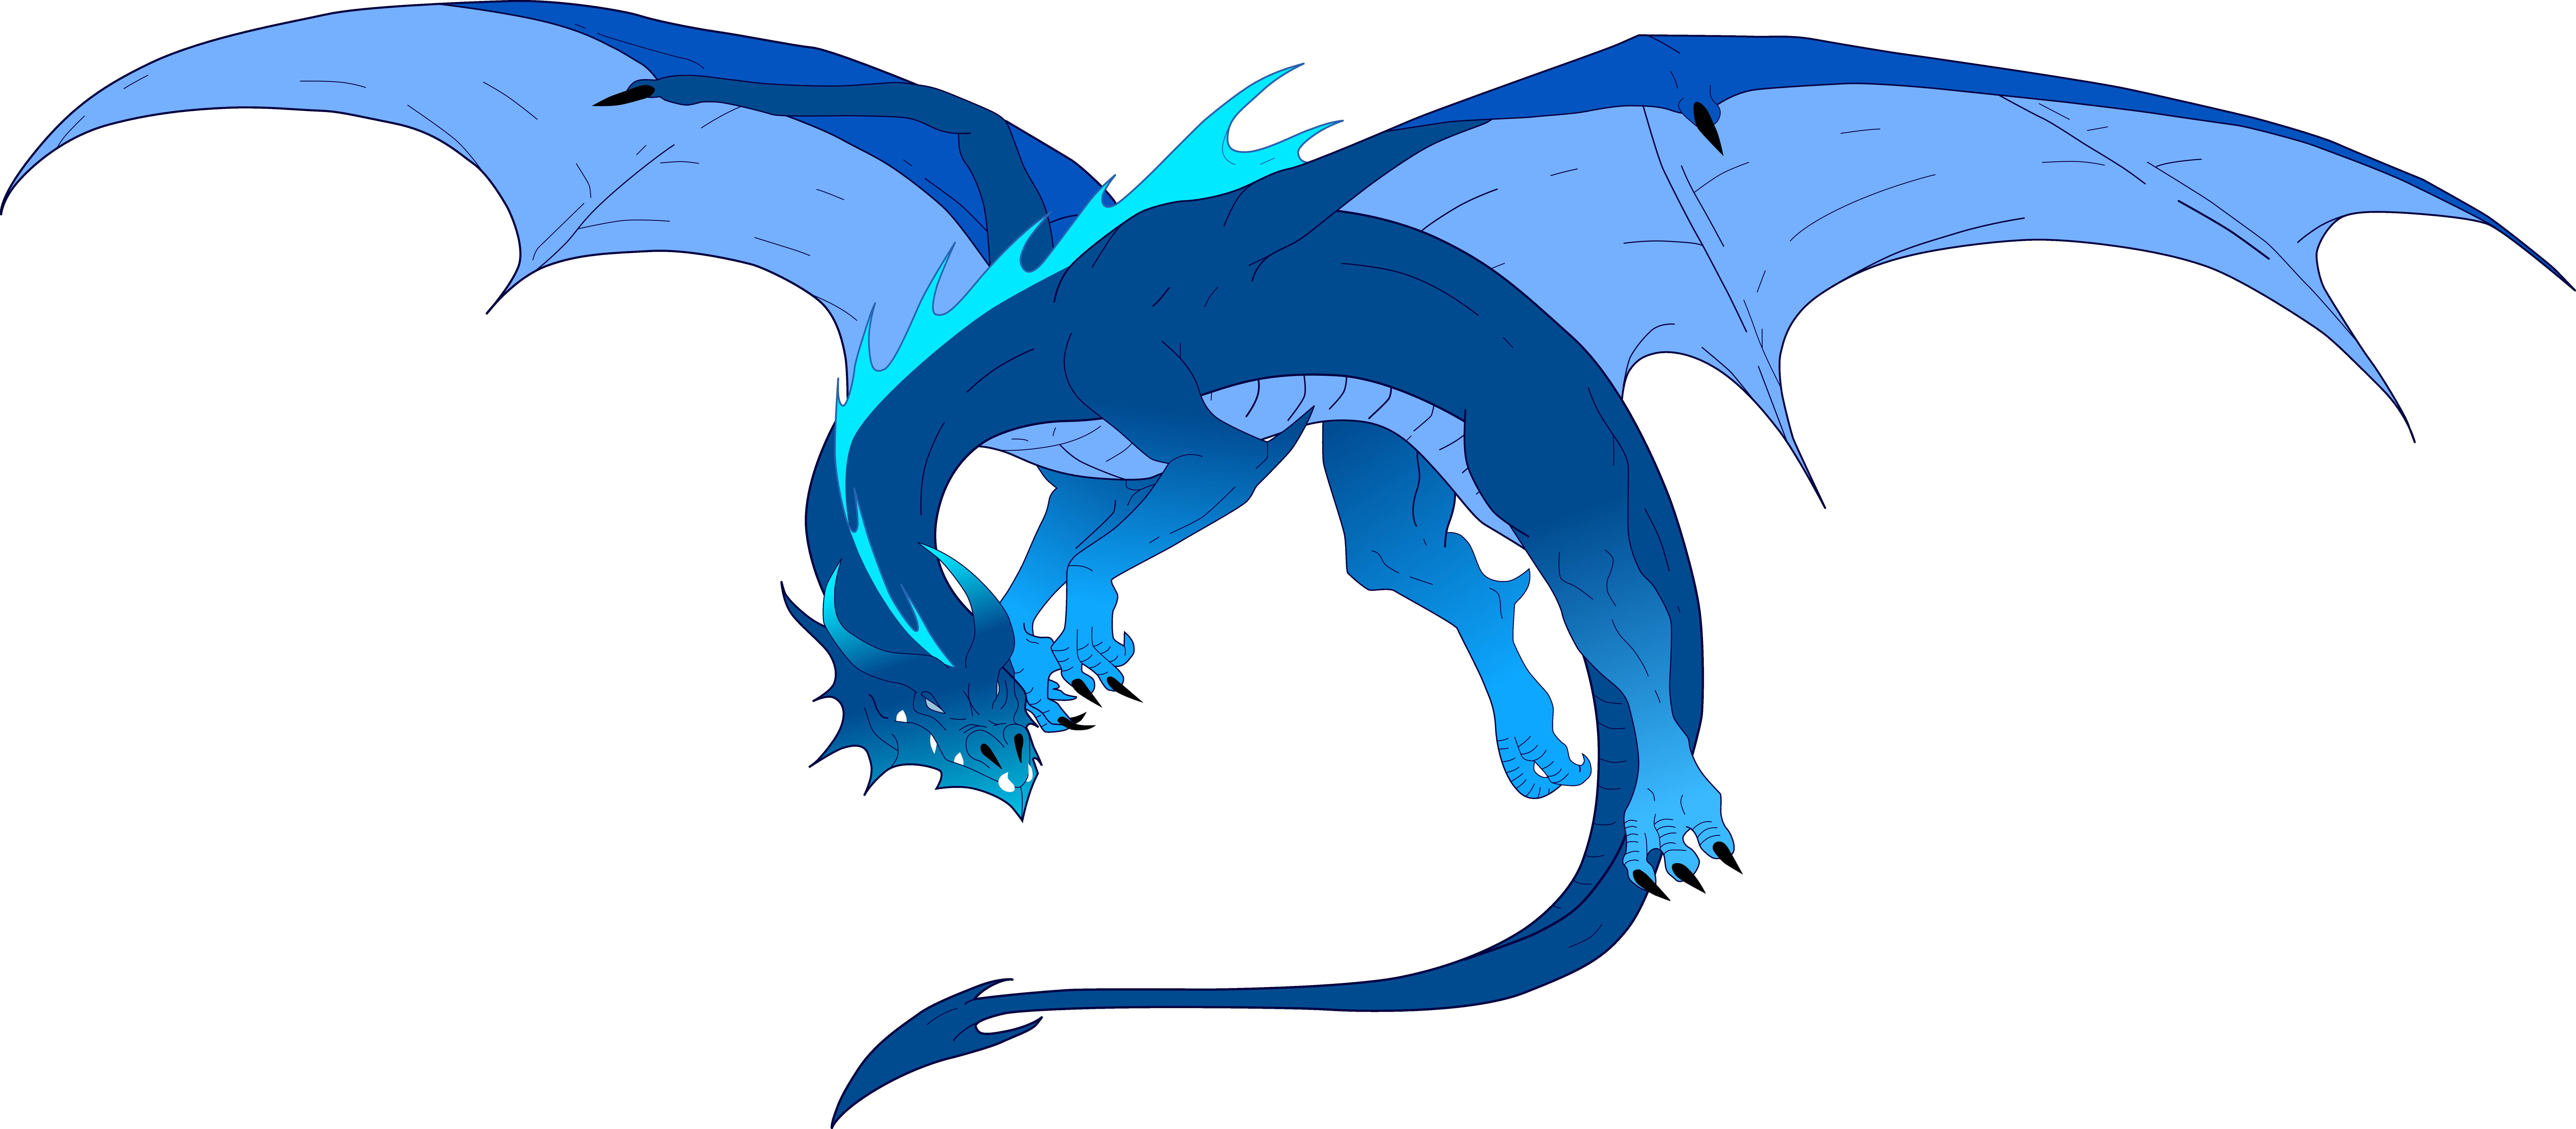 http://fc04.deviantart.net/fs71/f/2013/201/2/a/frost_as_a_dragon___frost_blast_by_fireflash_frostblast-d6eblhl.png